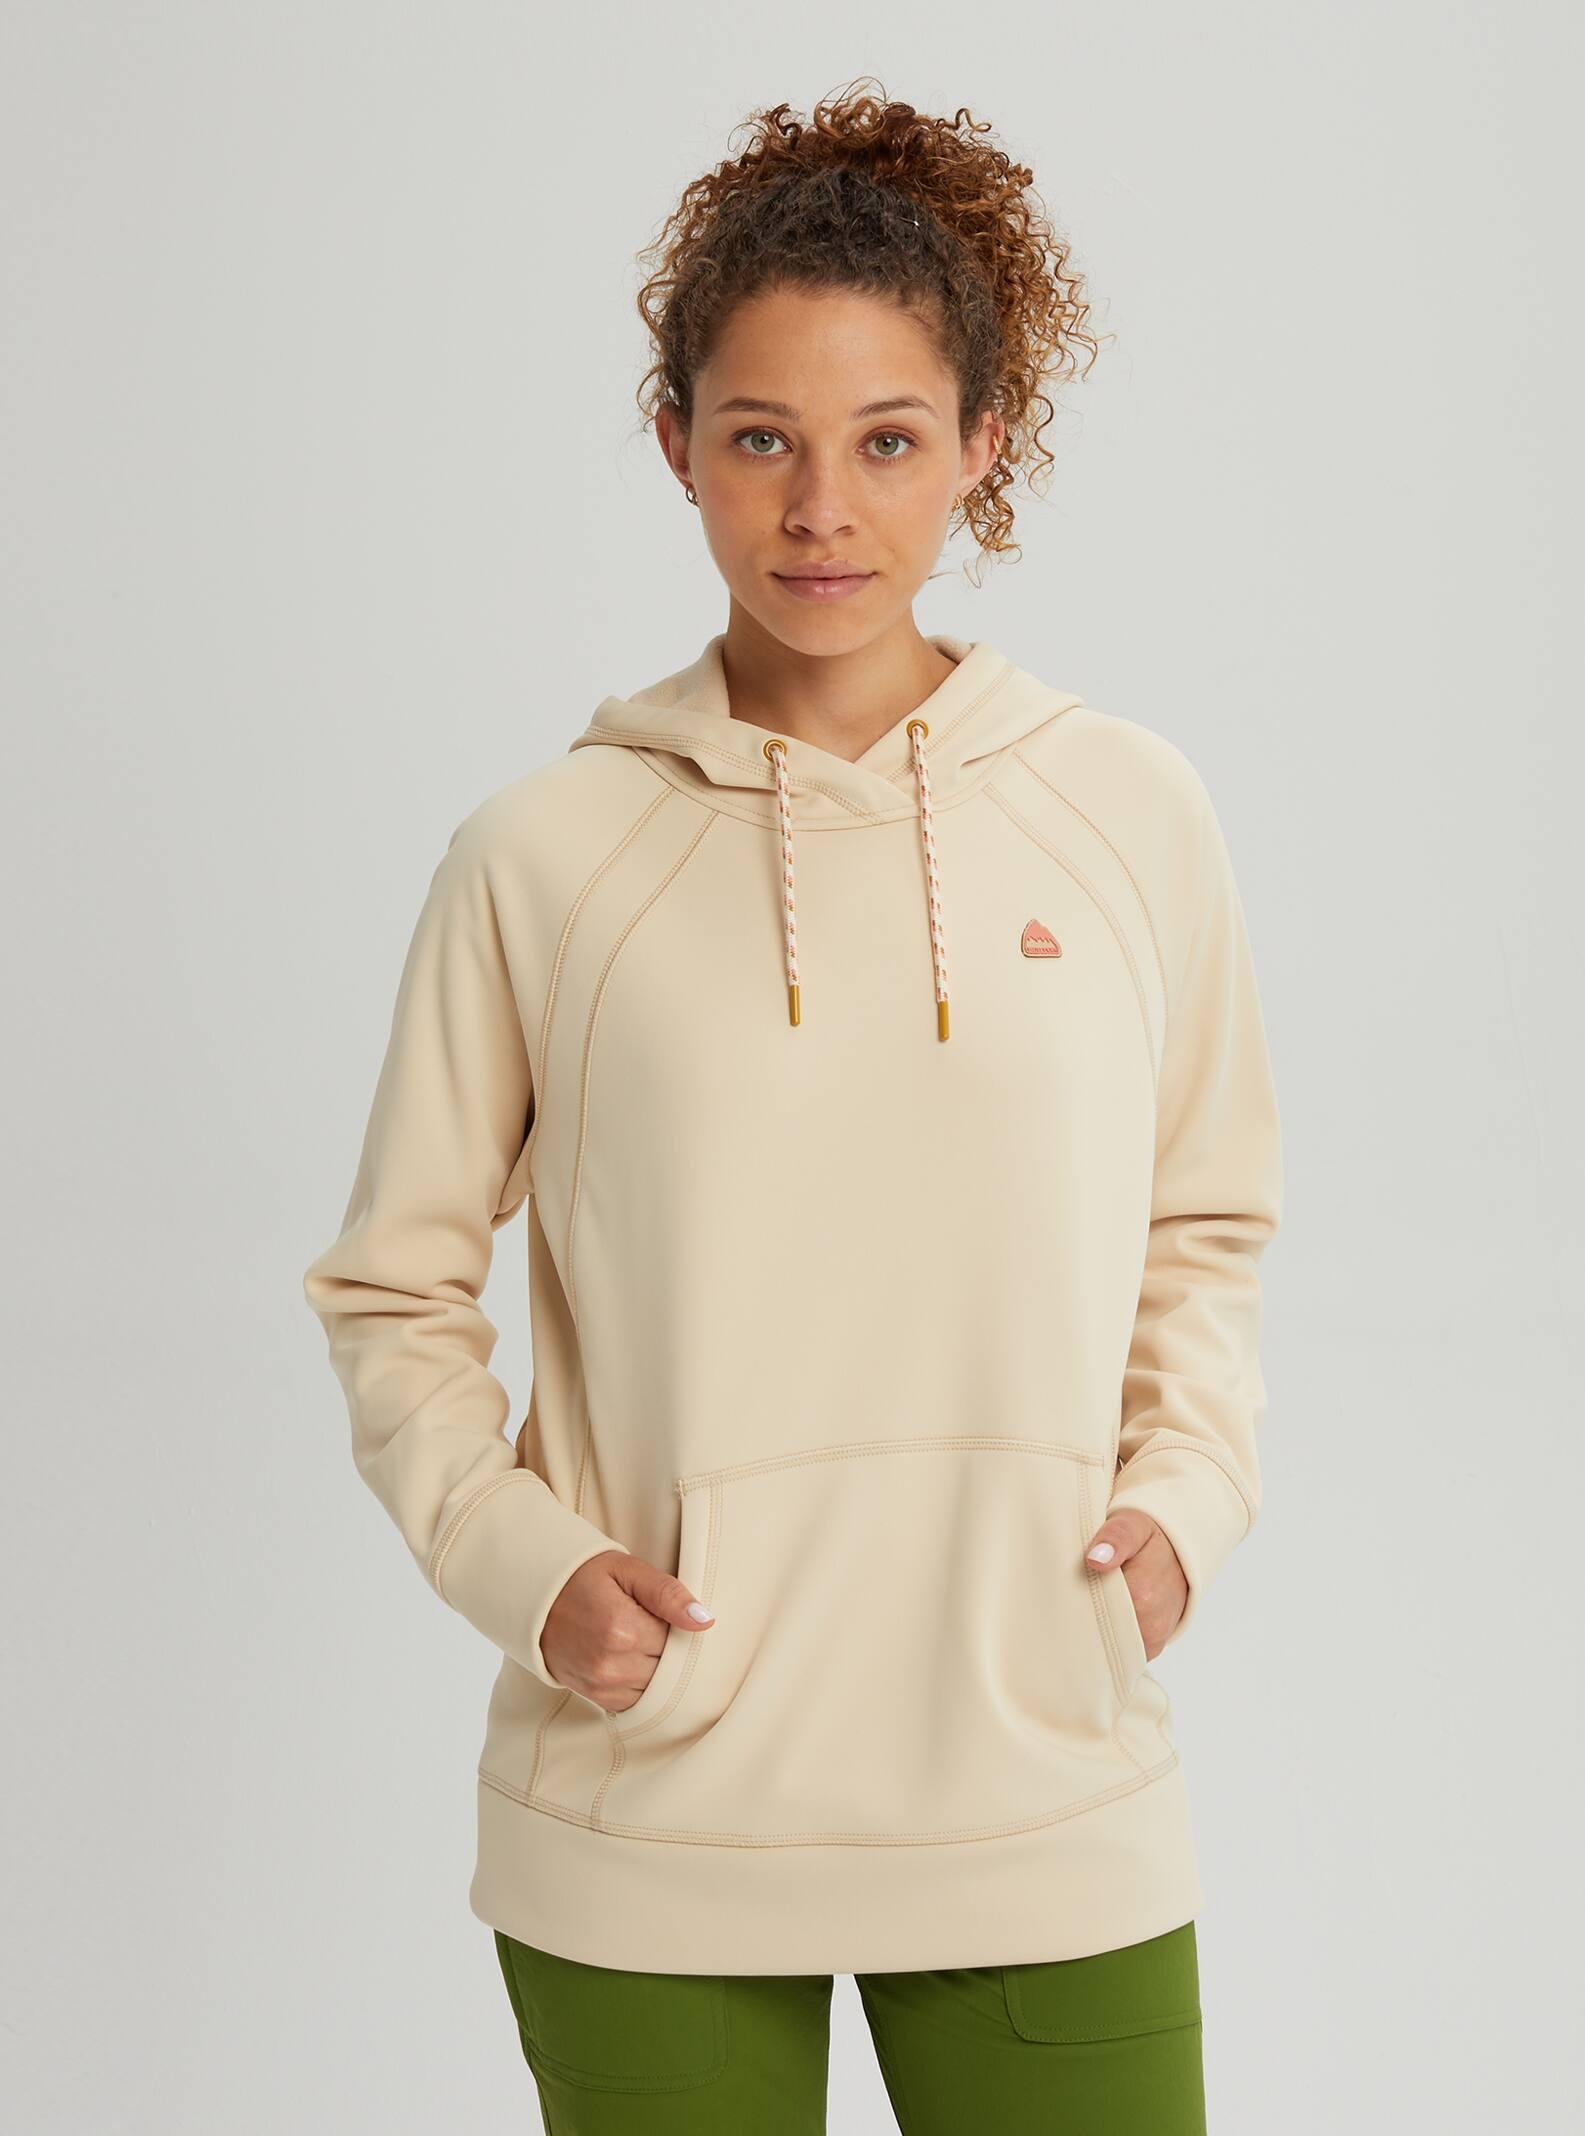 Flower Classic Regular Pocket Sweatershirt Hoodie Sweater for Women M Gray